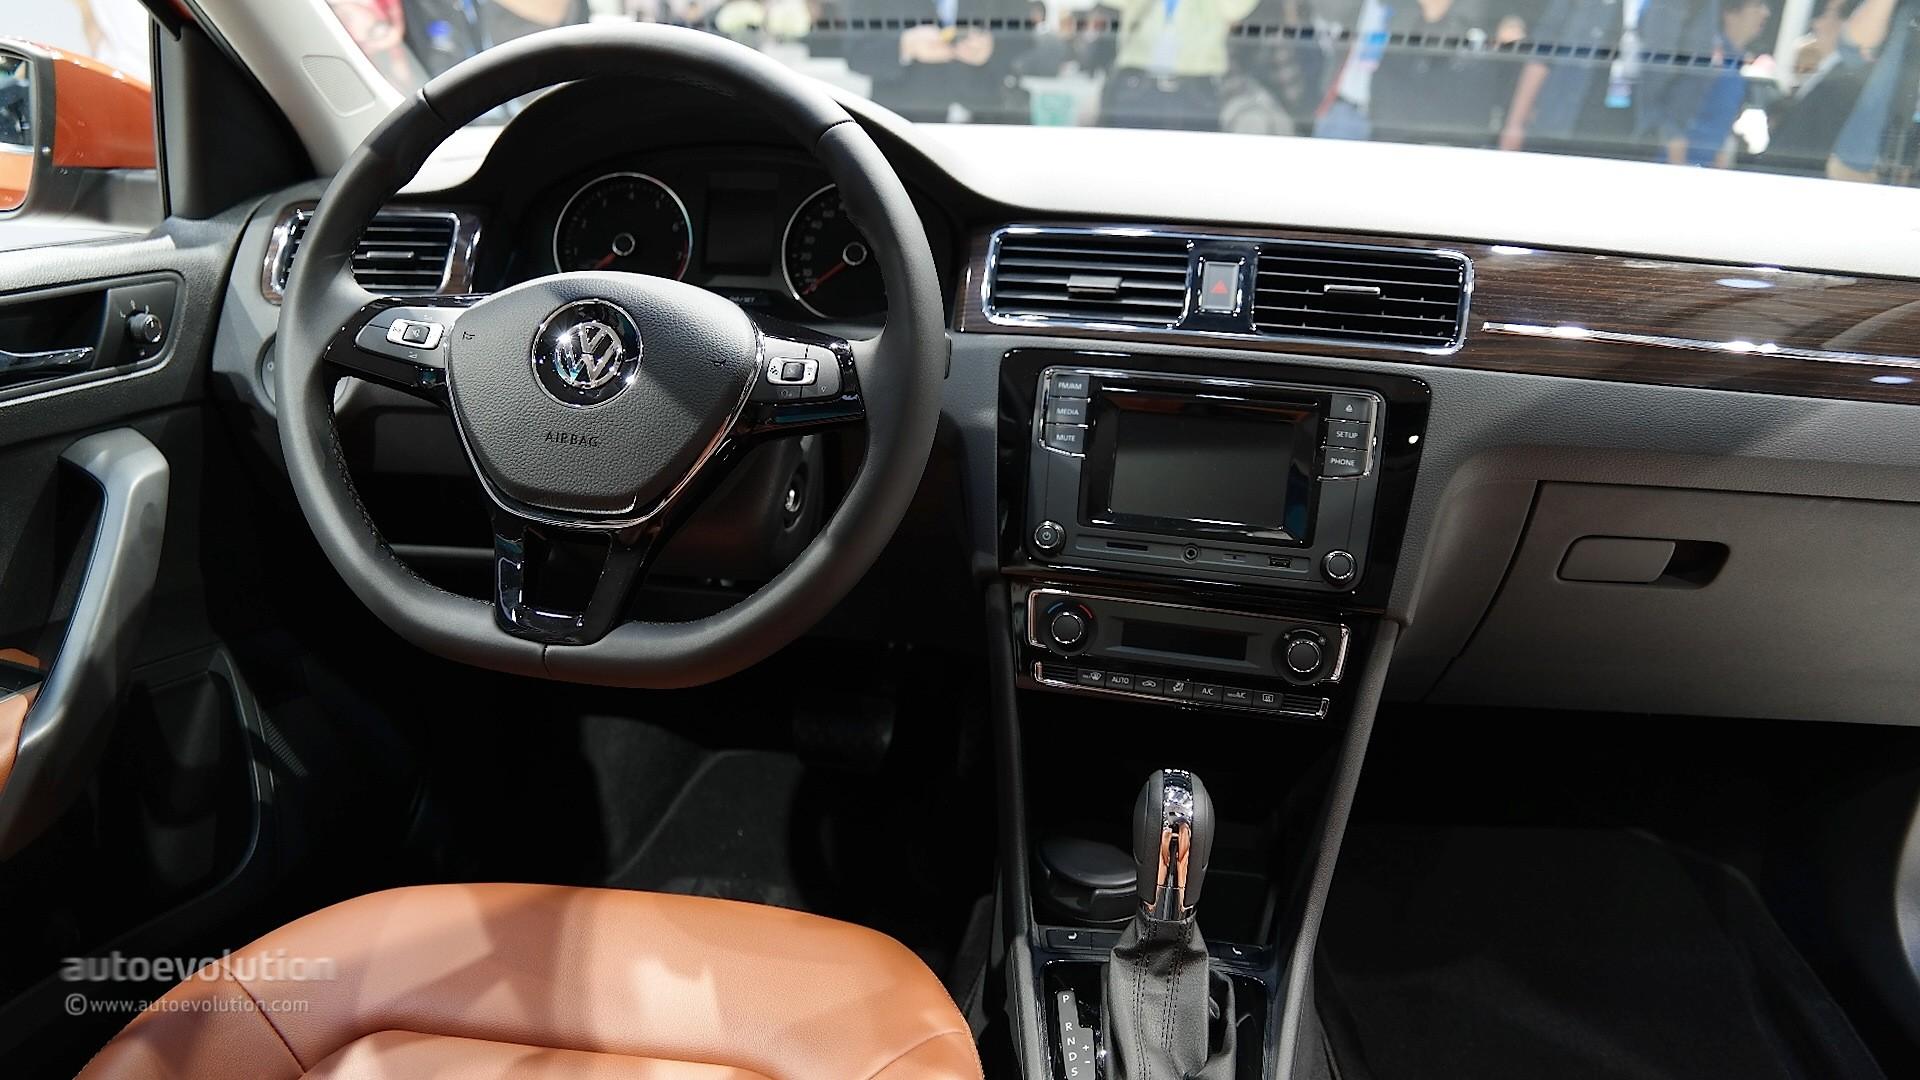 Vw Atlas Based On Q7 2017 2018 2019 Volkswagen Reviews